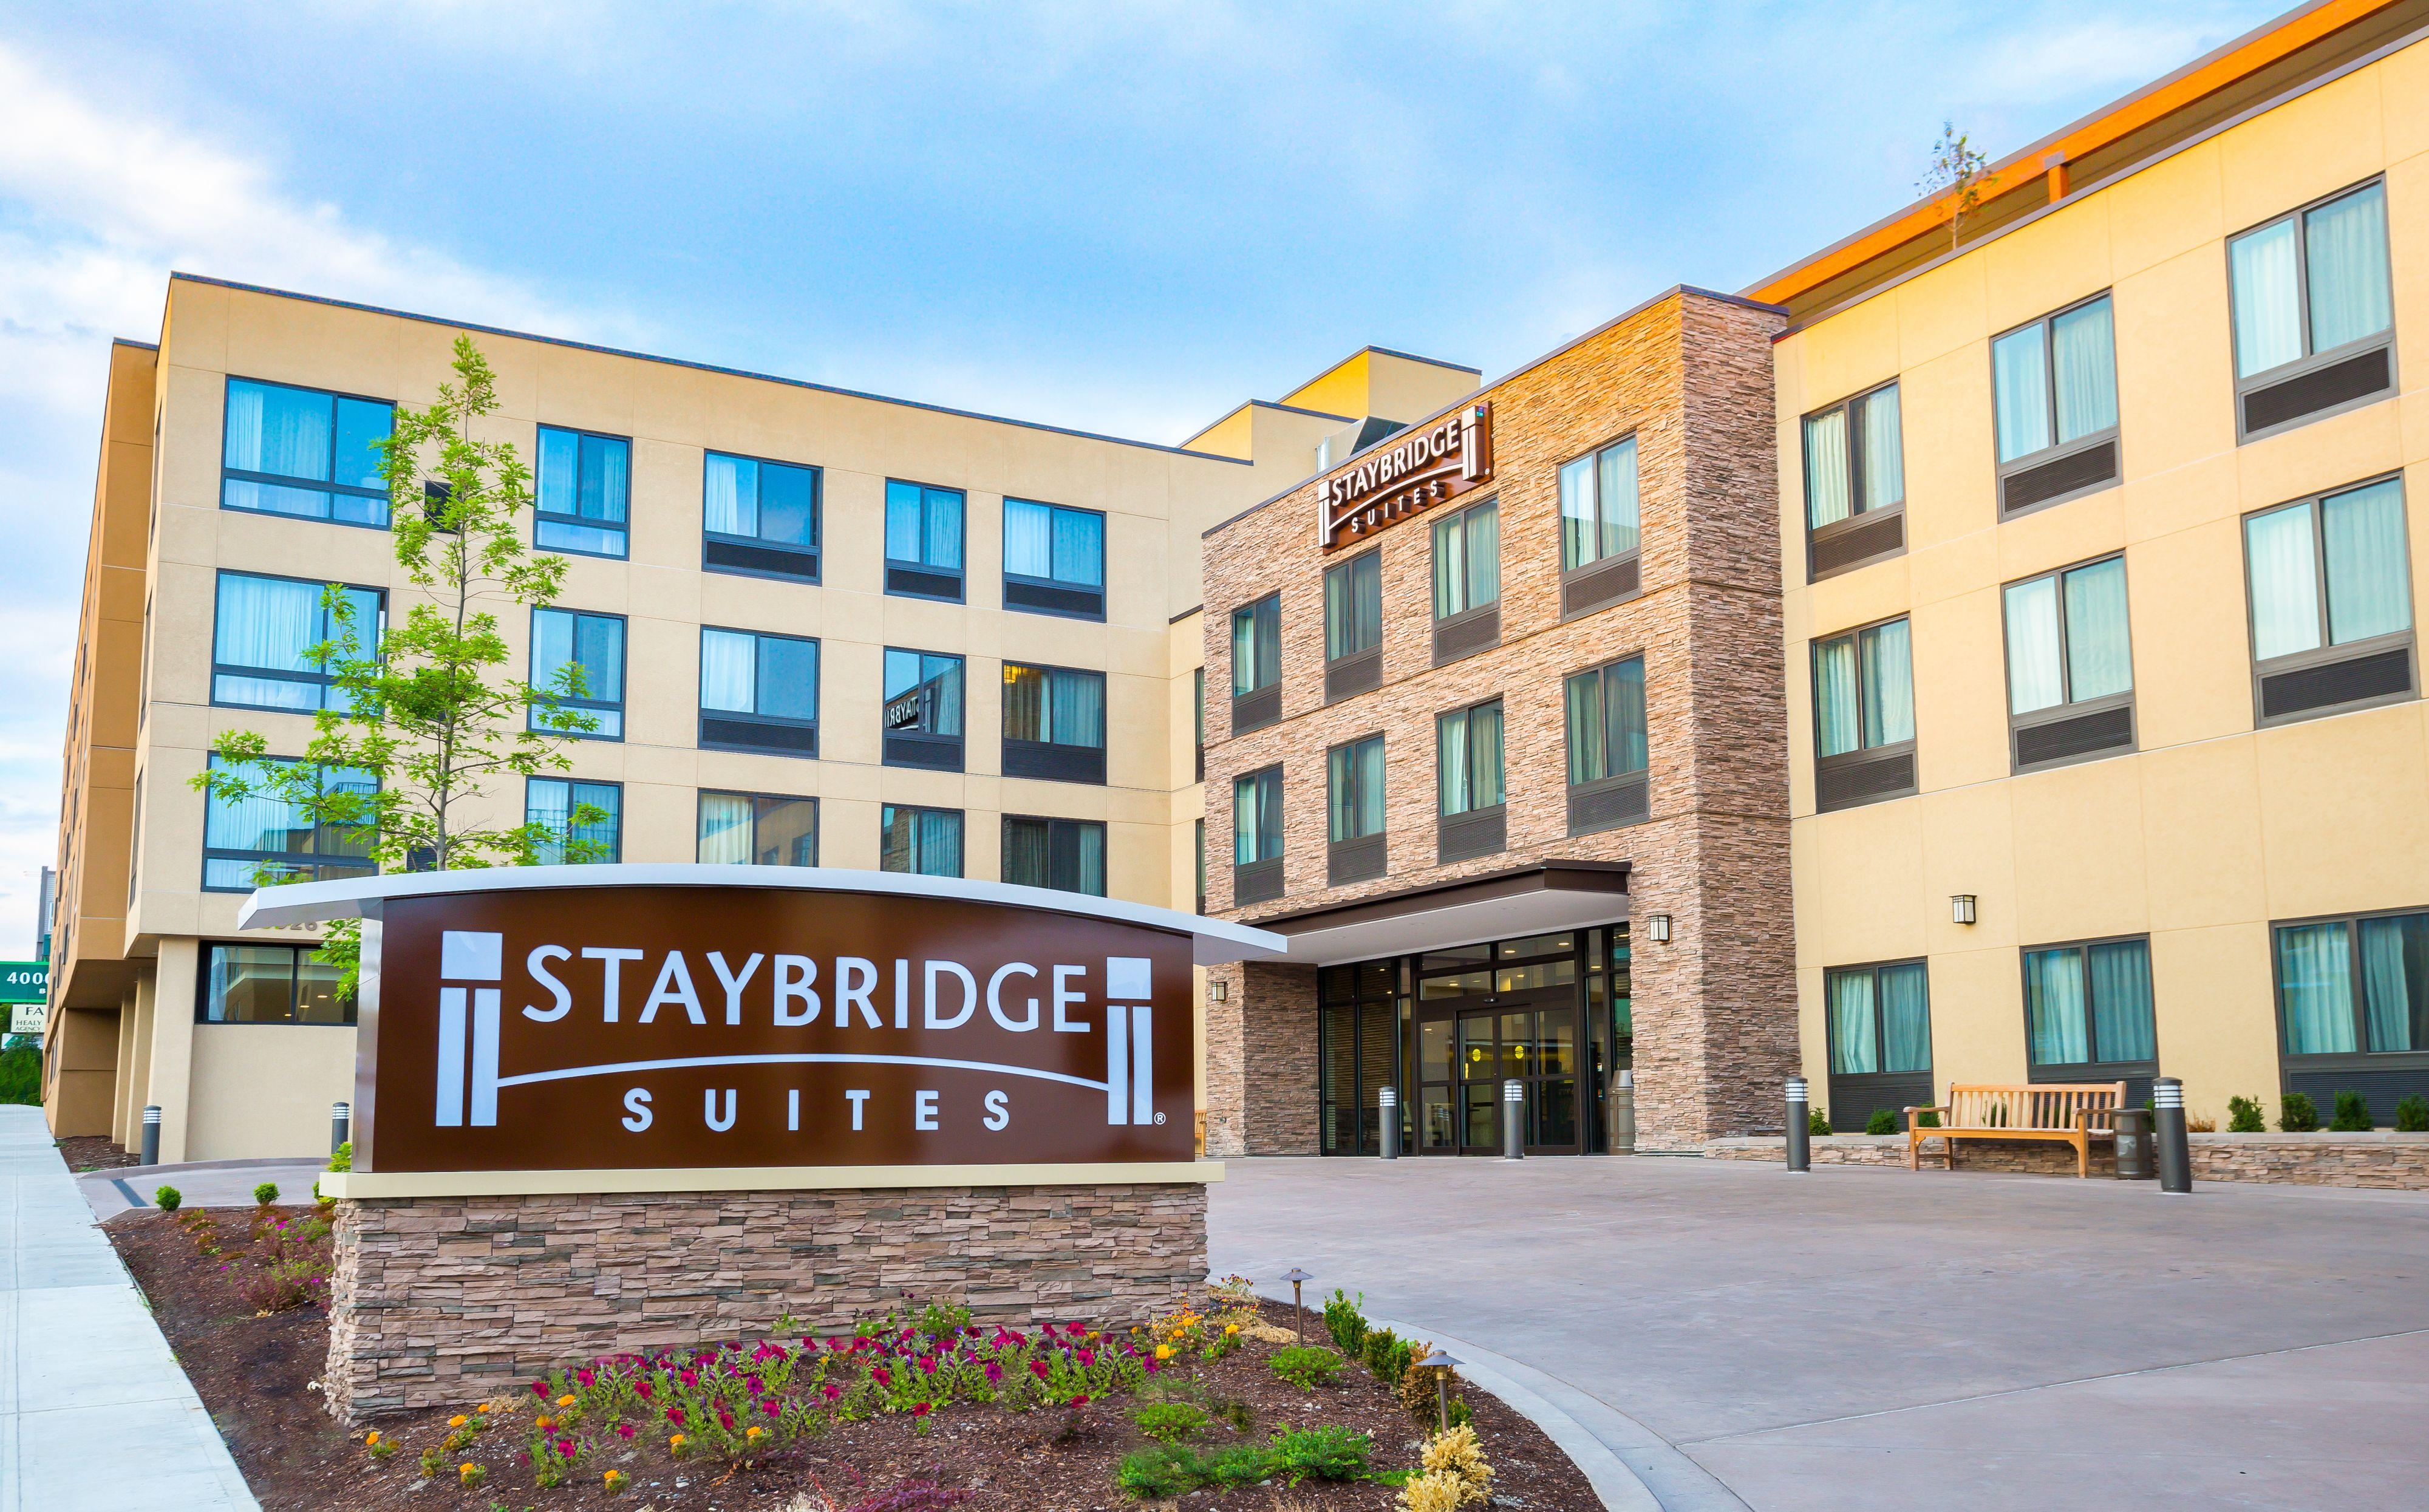 staybridge-suites-seattle-4079661155-original.jpg